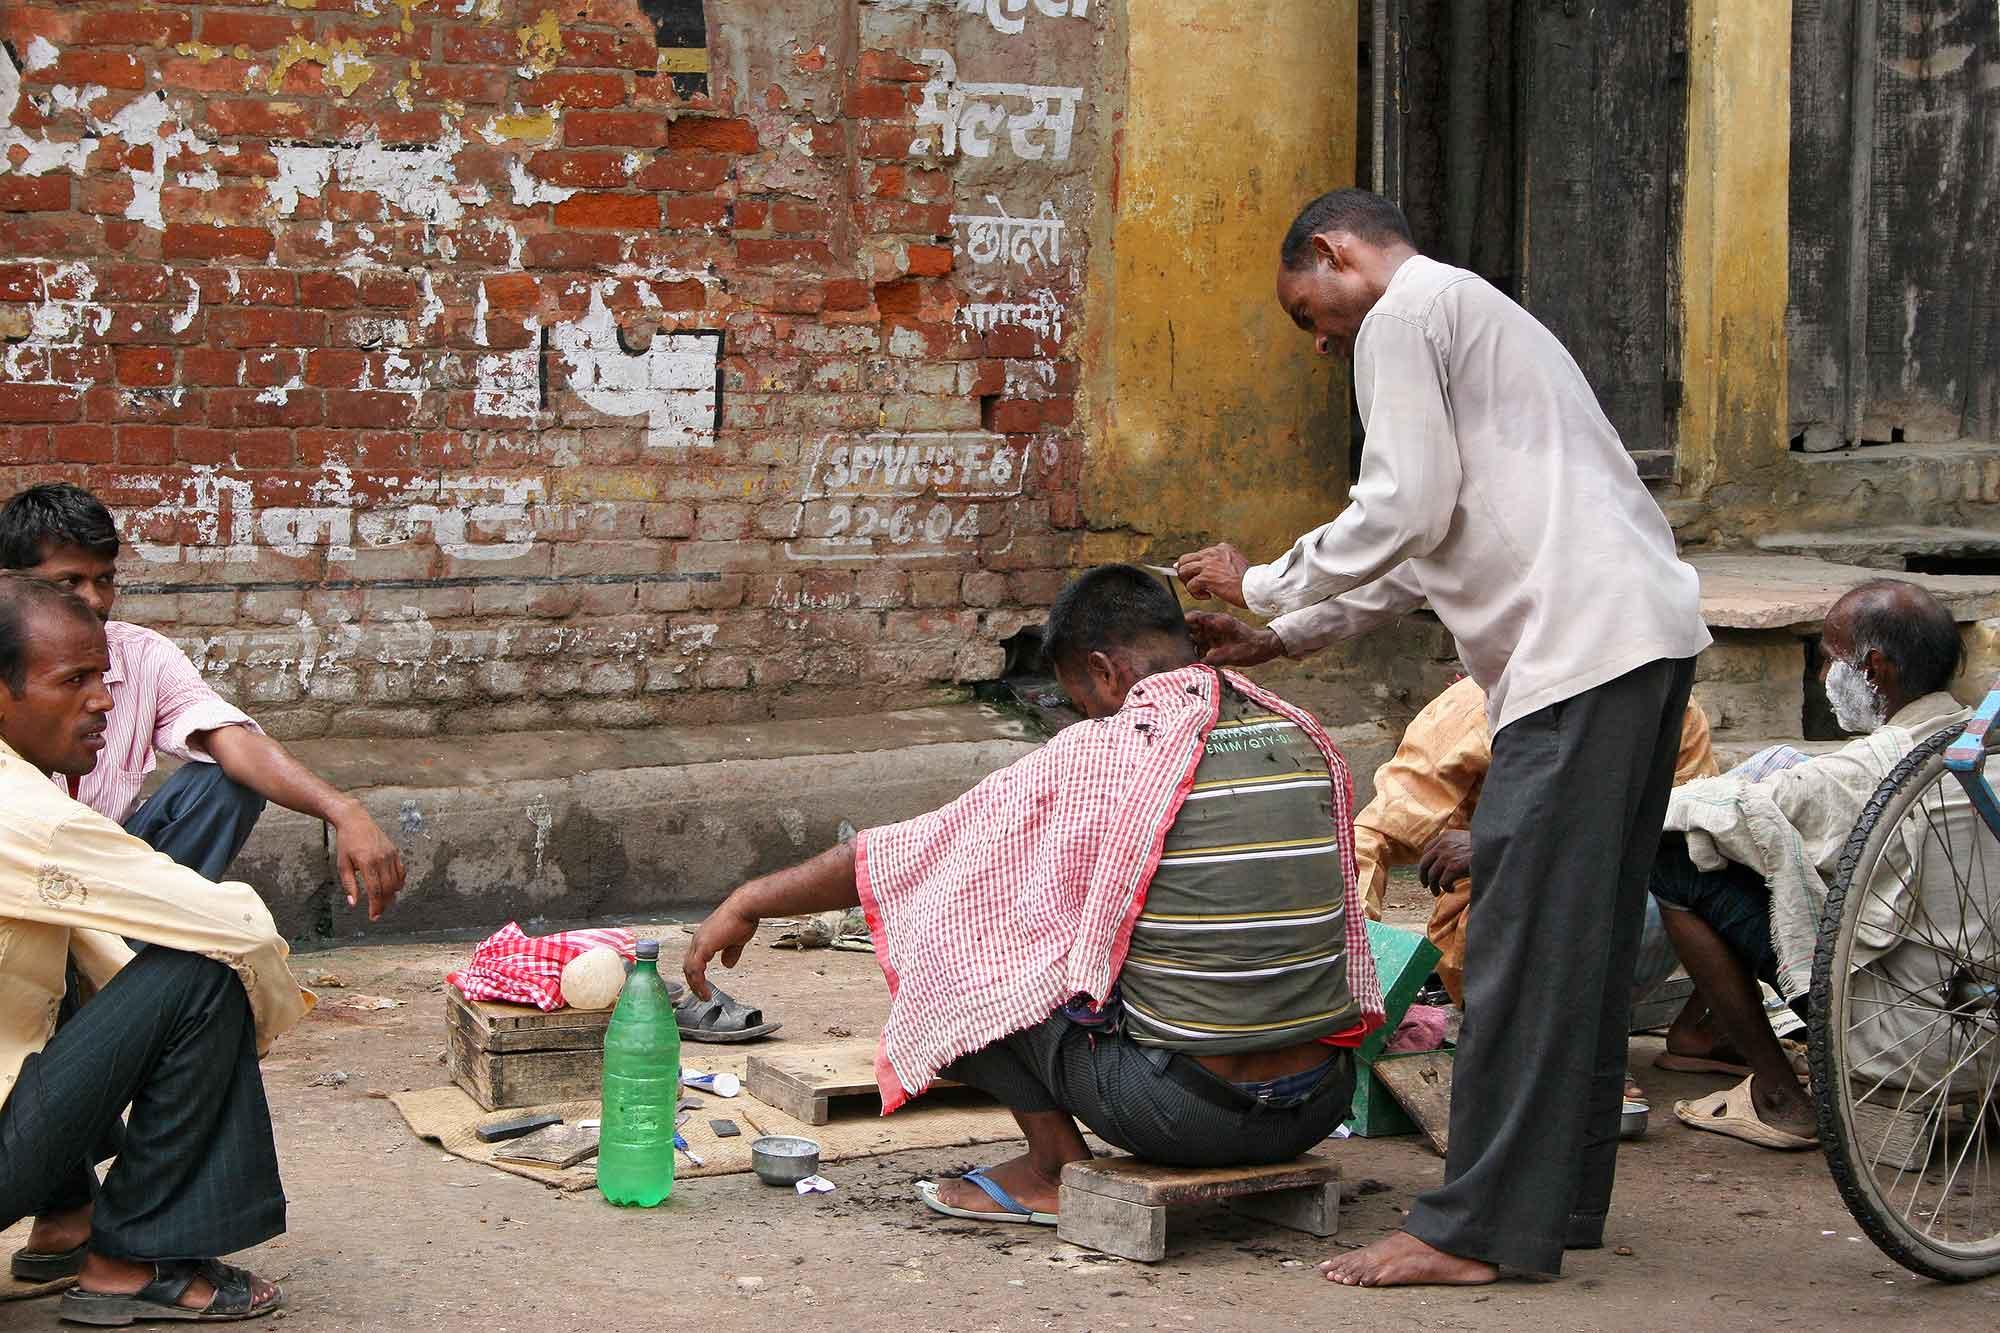 barber-shop-streets-varanasi-india